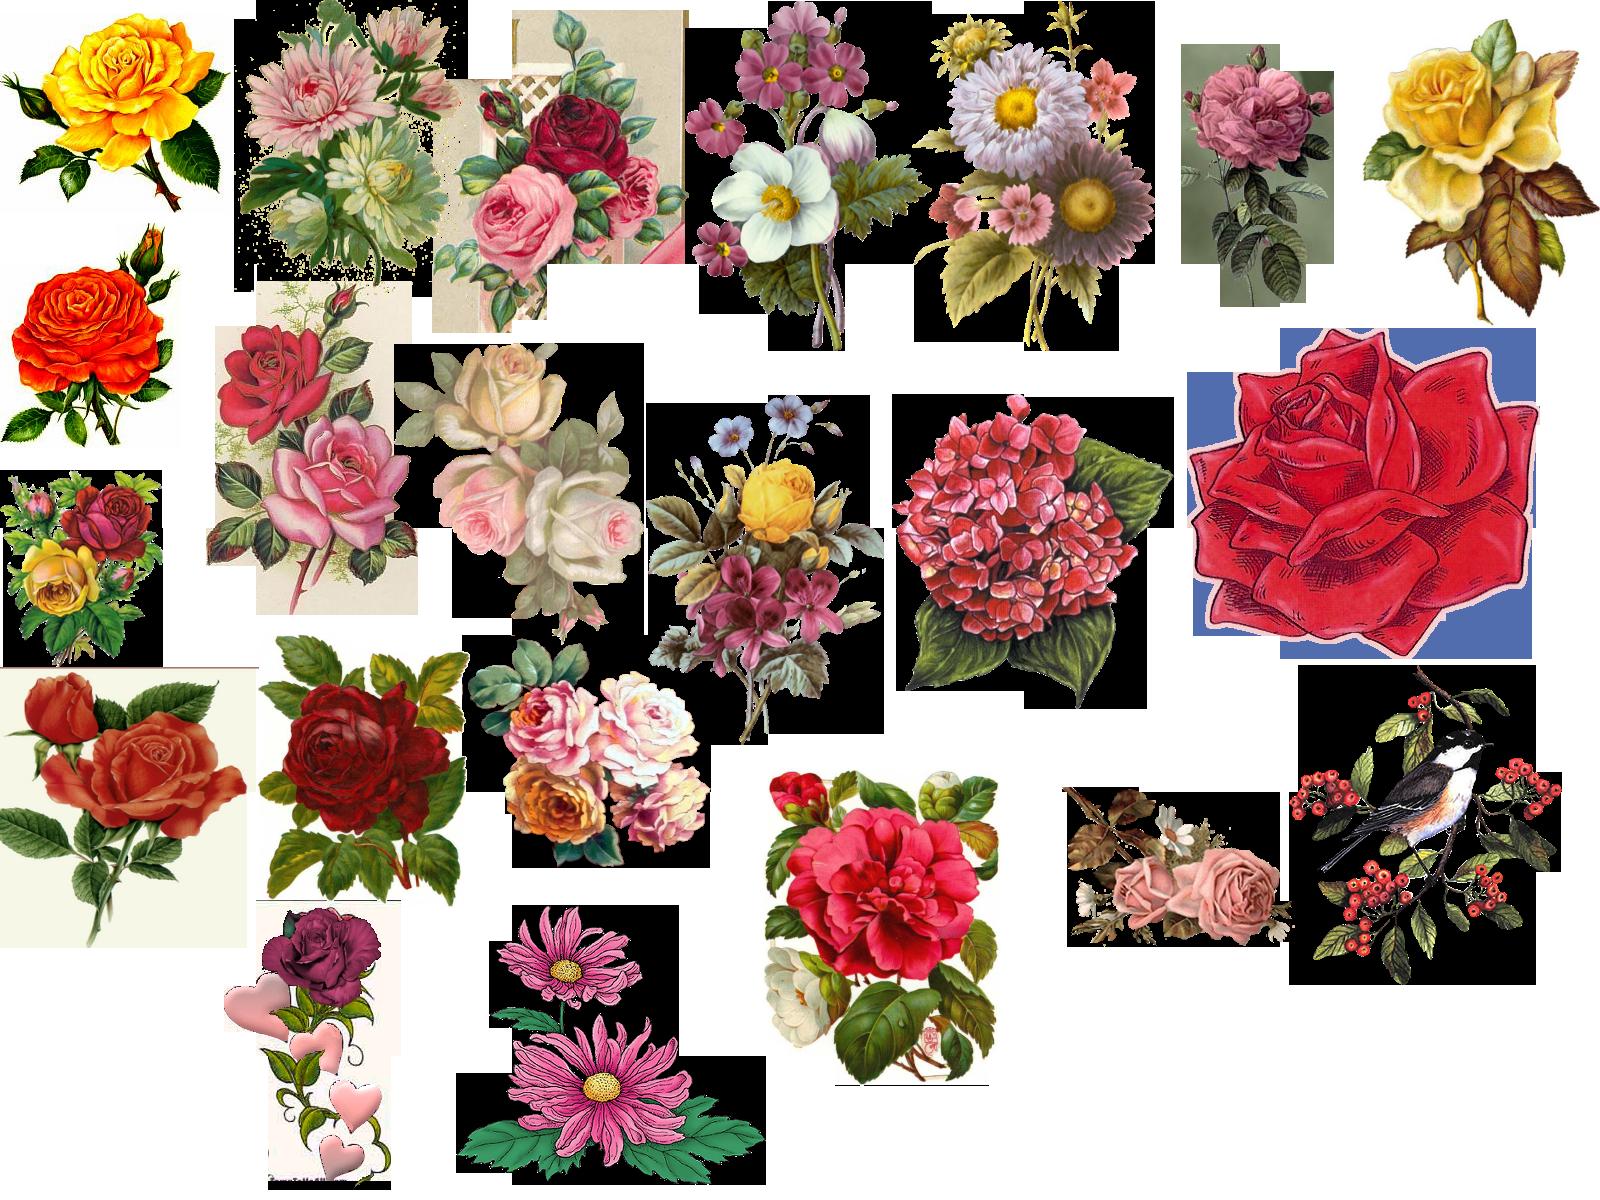 Vintage flower clipart free jpg royalty free download Vintage Flower Pictures - Beautiful Flowers | hcthc | Pinterest ... jpg royalty free download